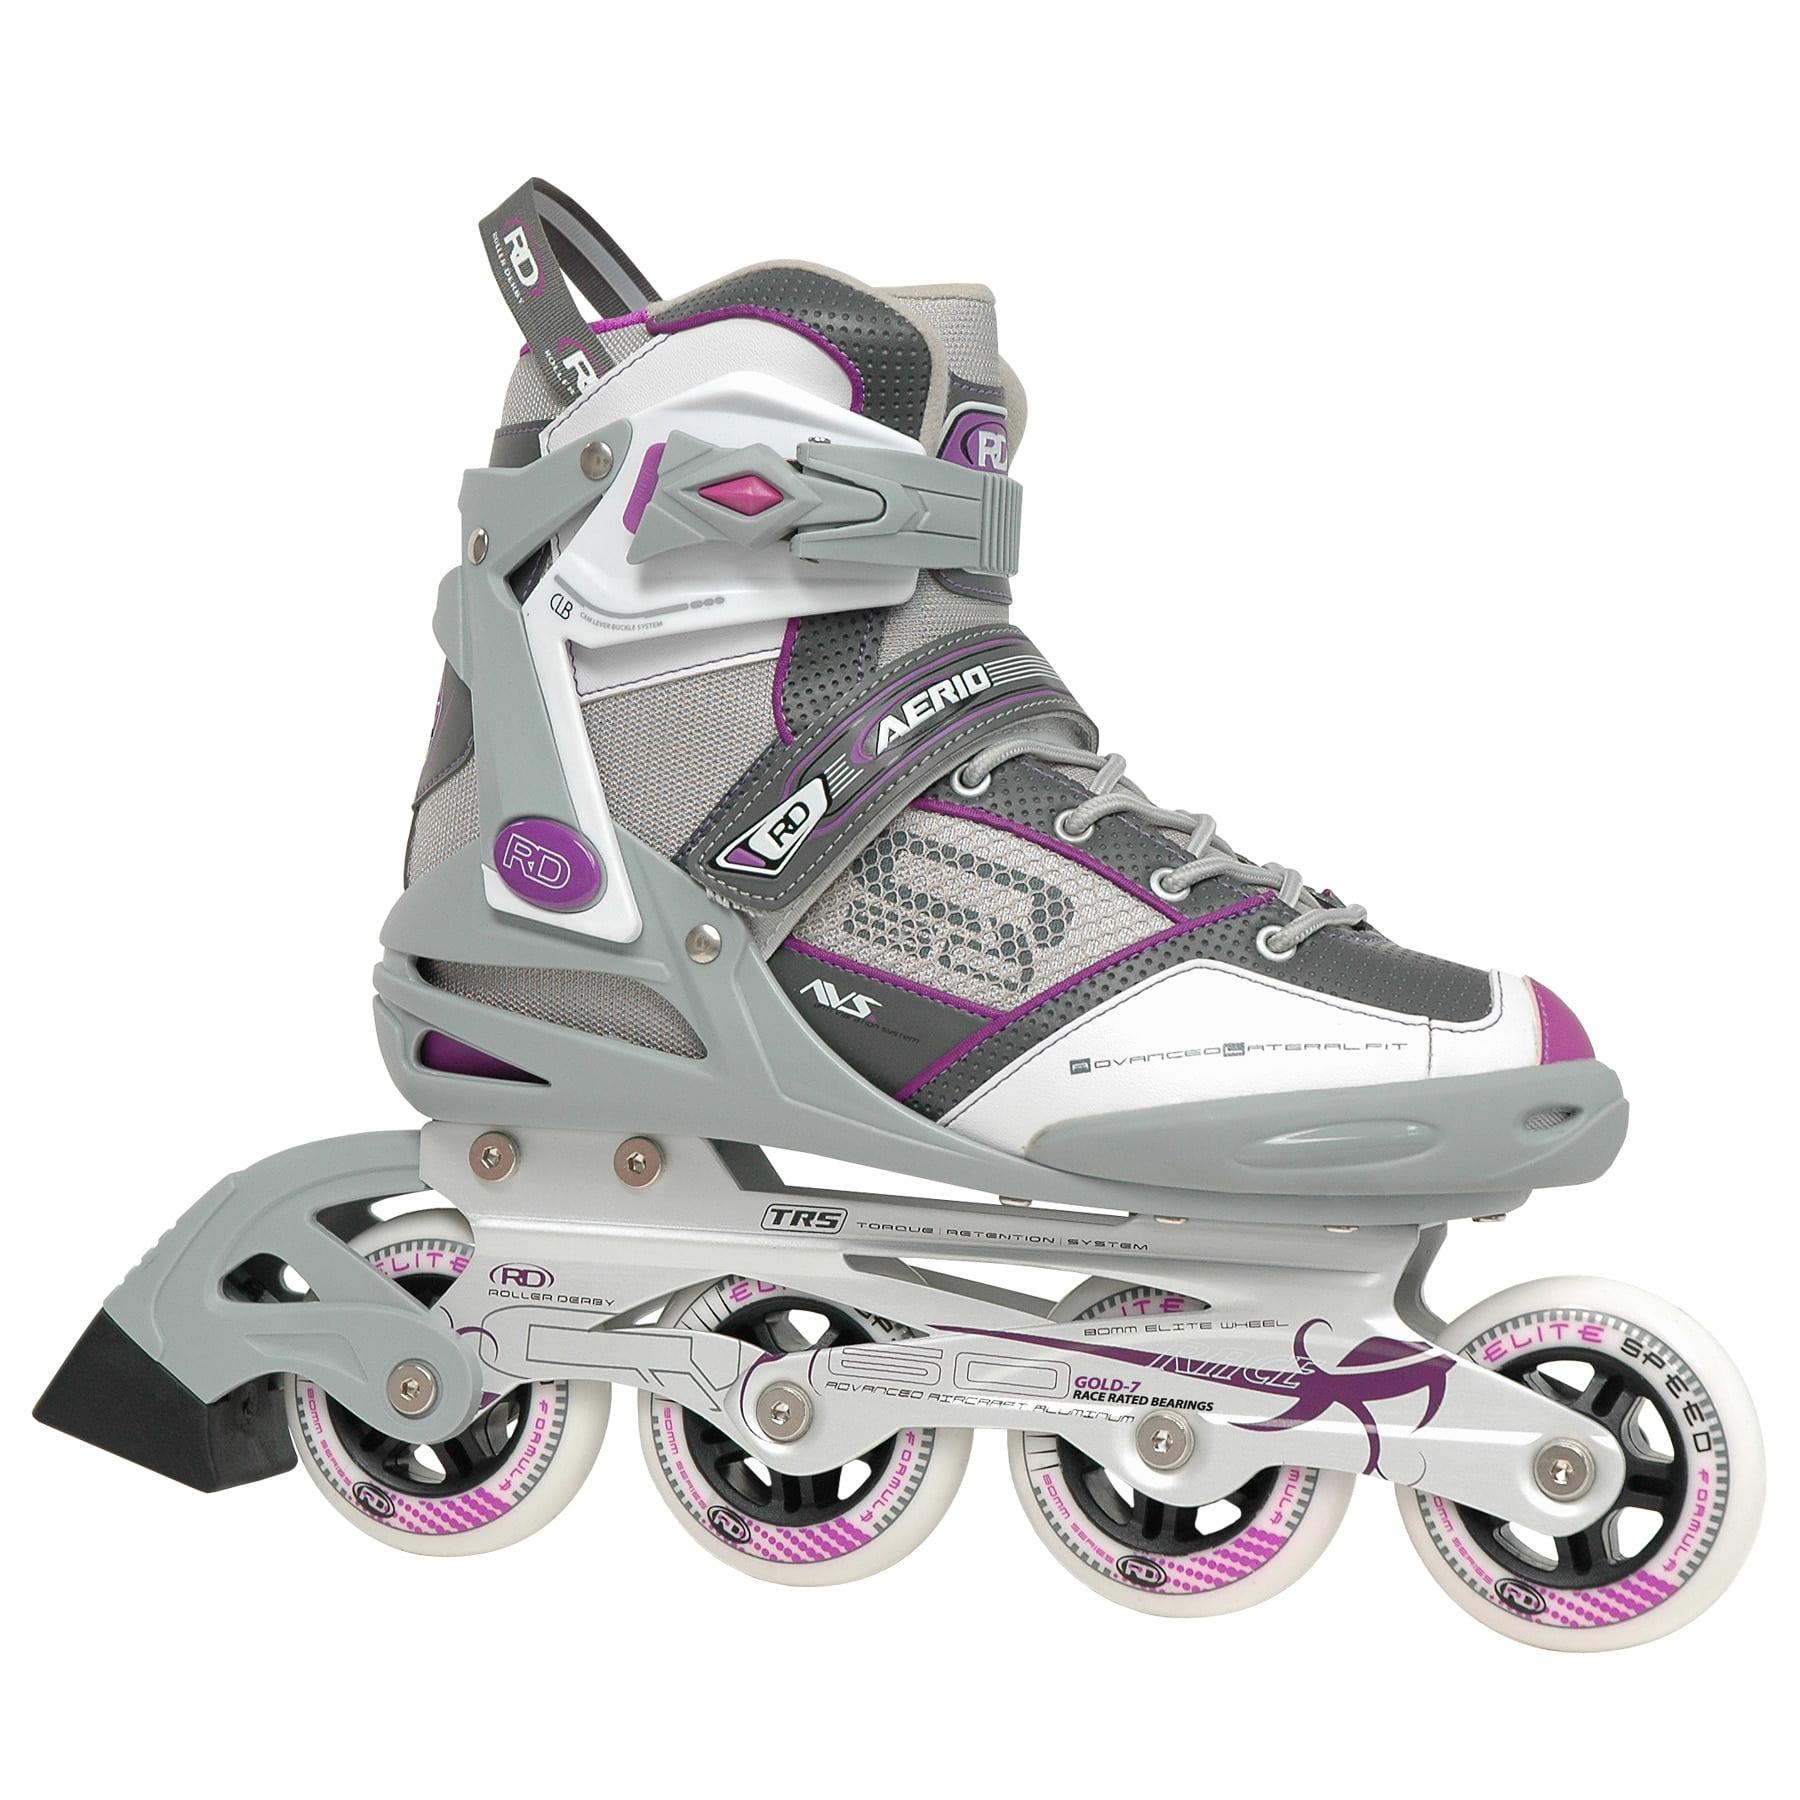 Roller skate shoes walmart - Aerio Q 60 Women S Inline Skates